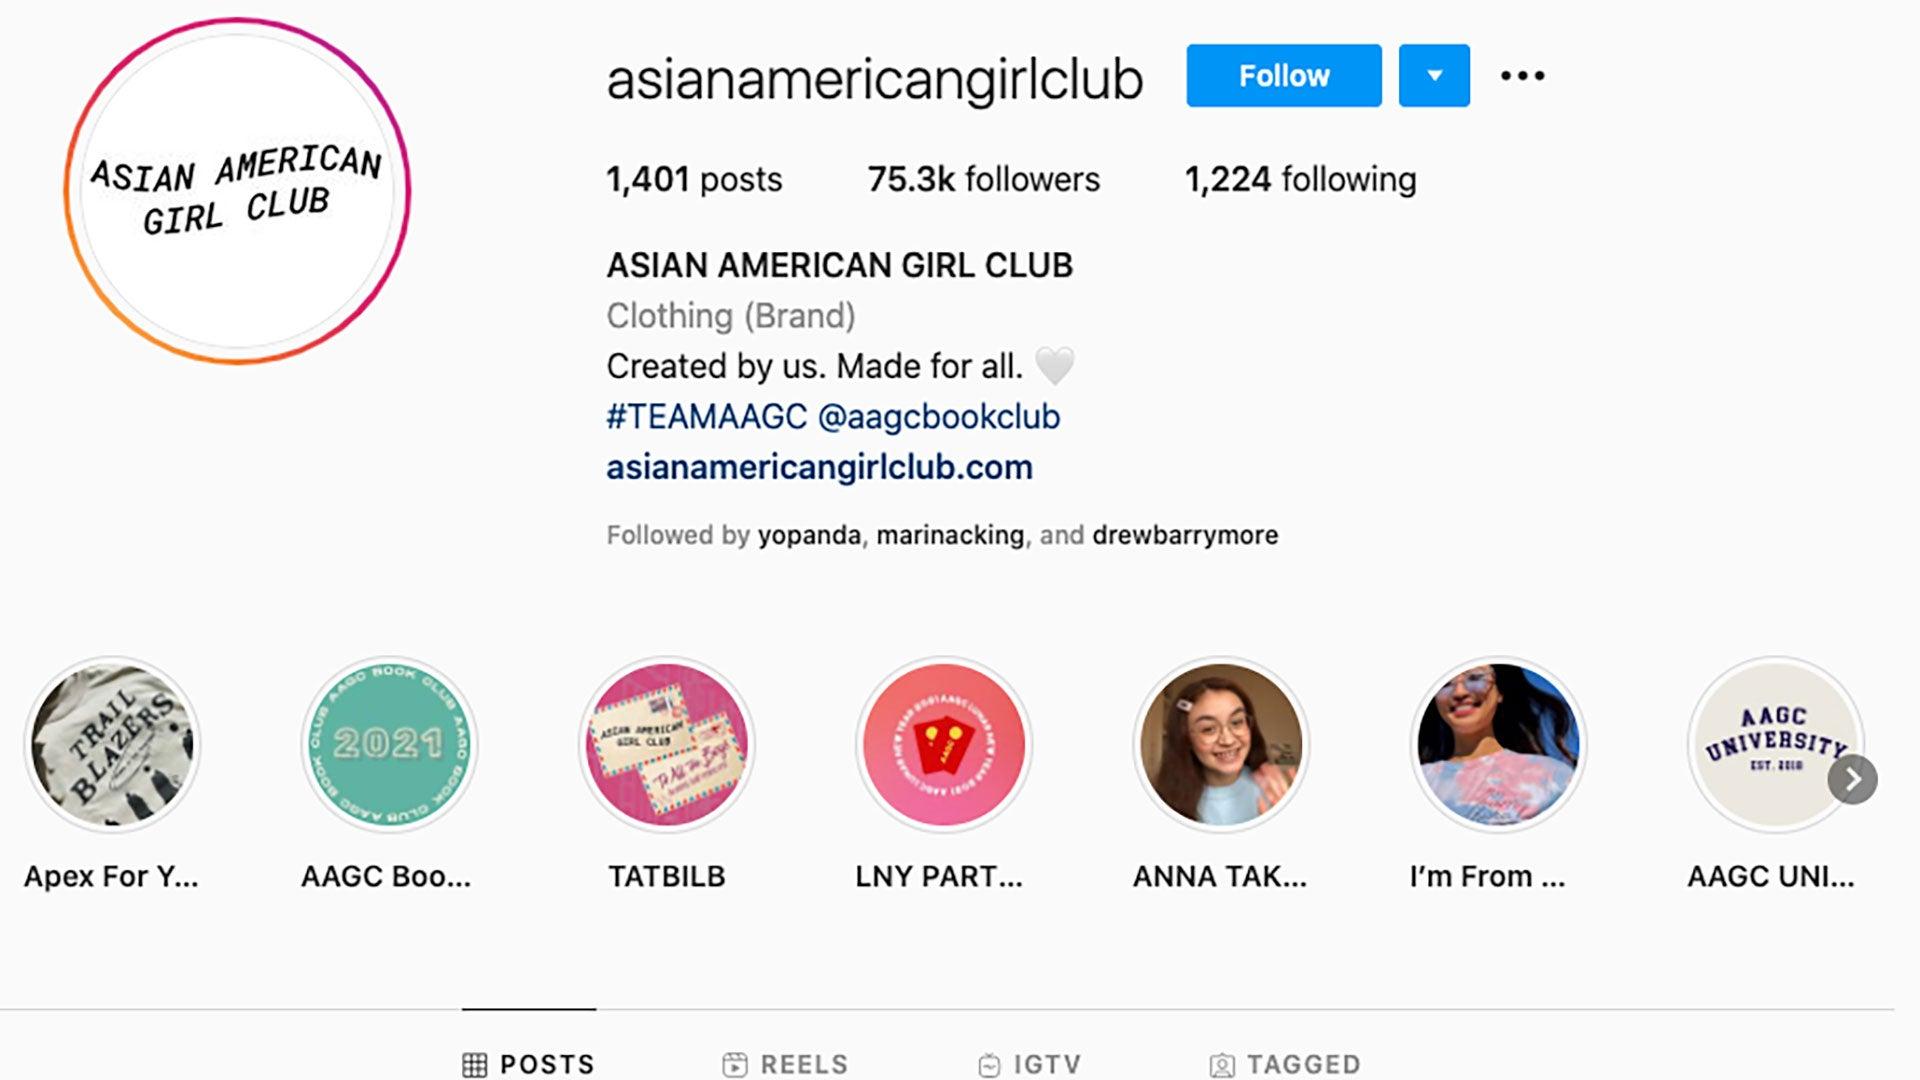 Asian American Girl Club IG